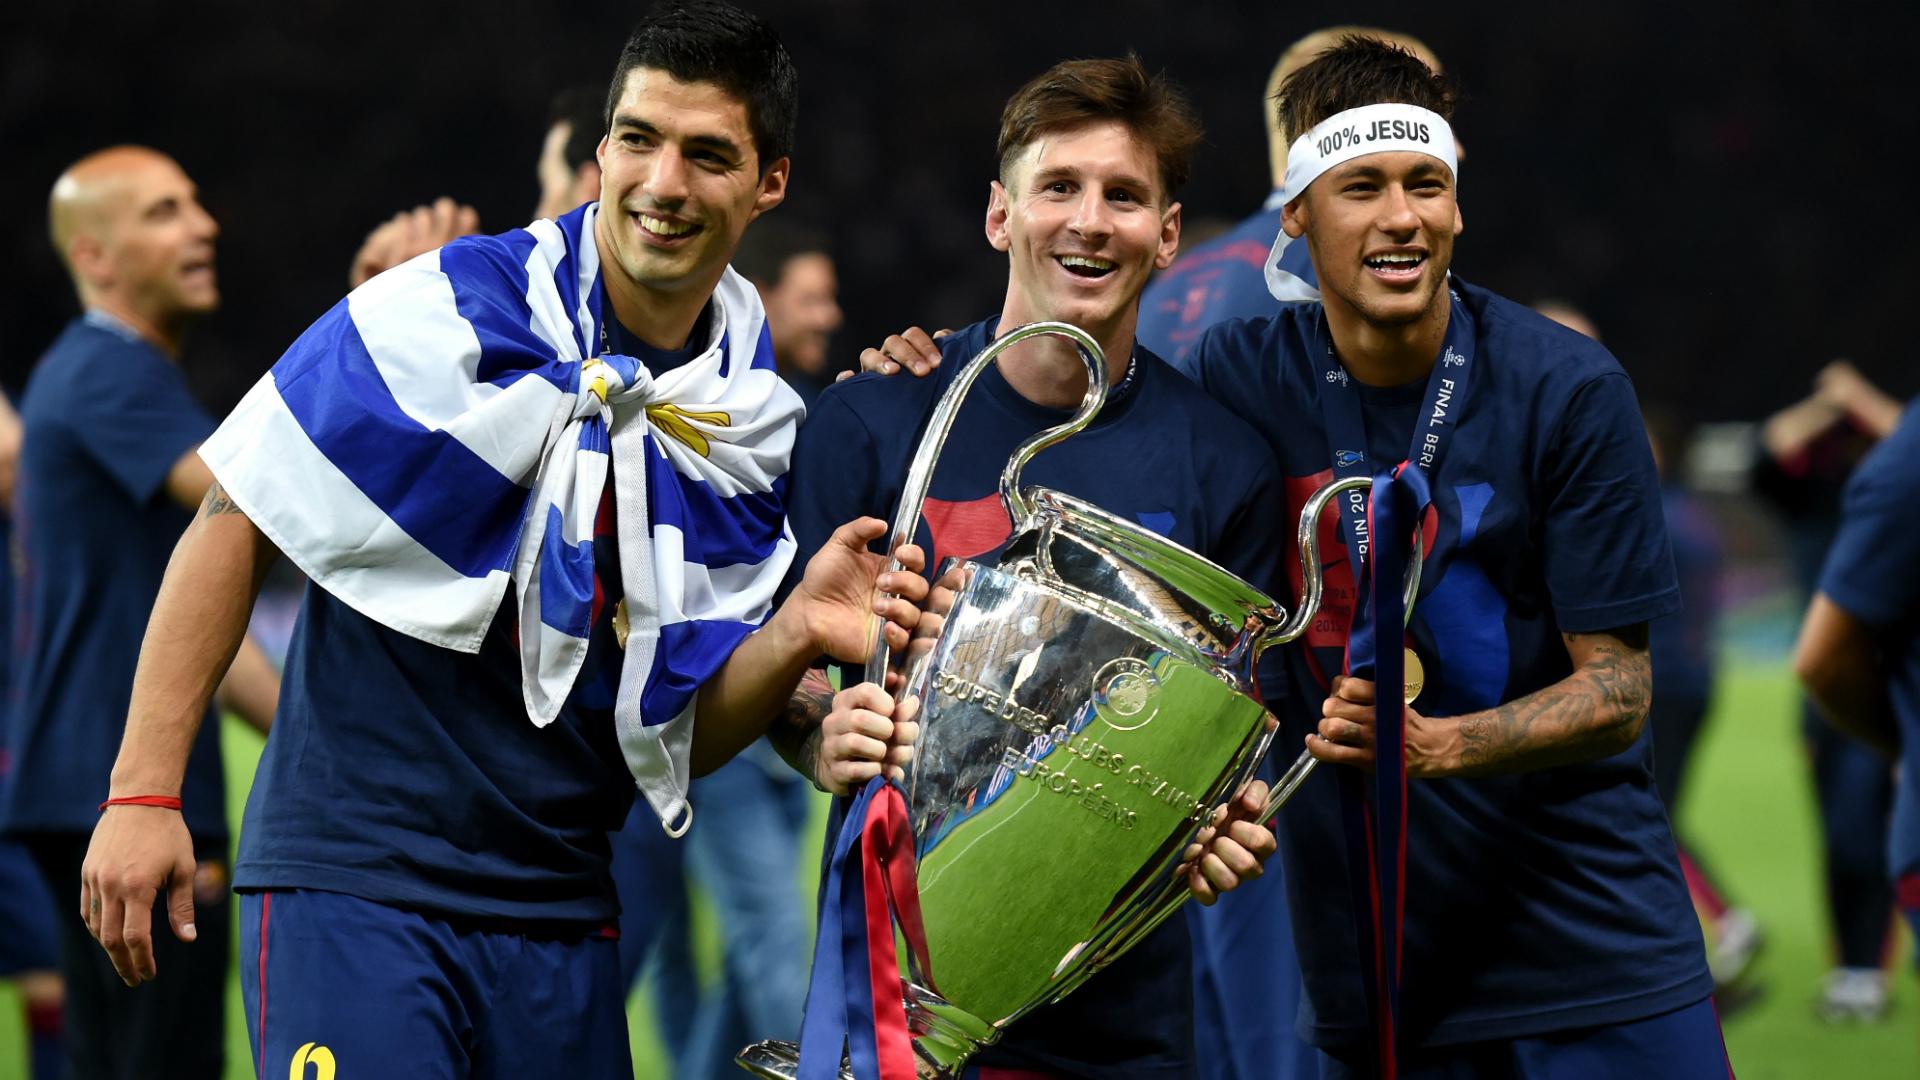 'Messi, Suarez & Neymar should be Ballon d'Or trio' - Bartomeu